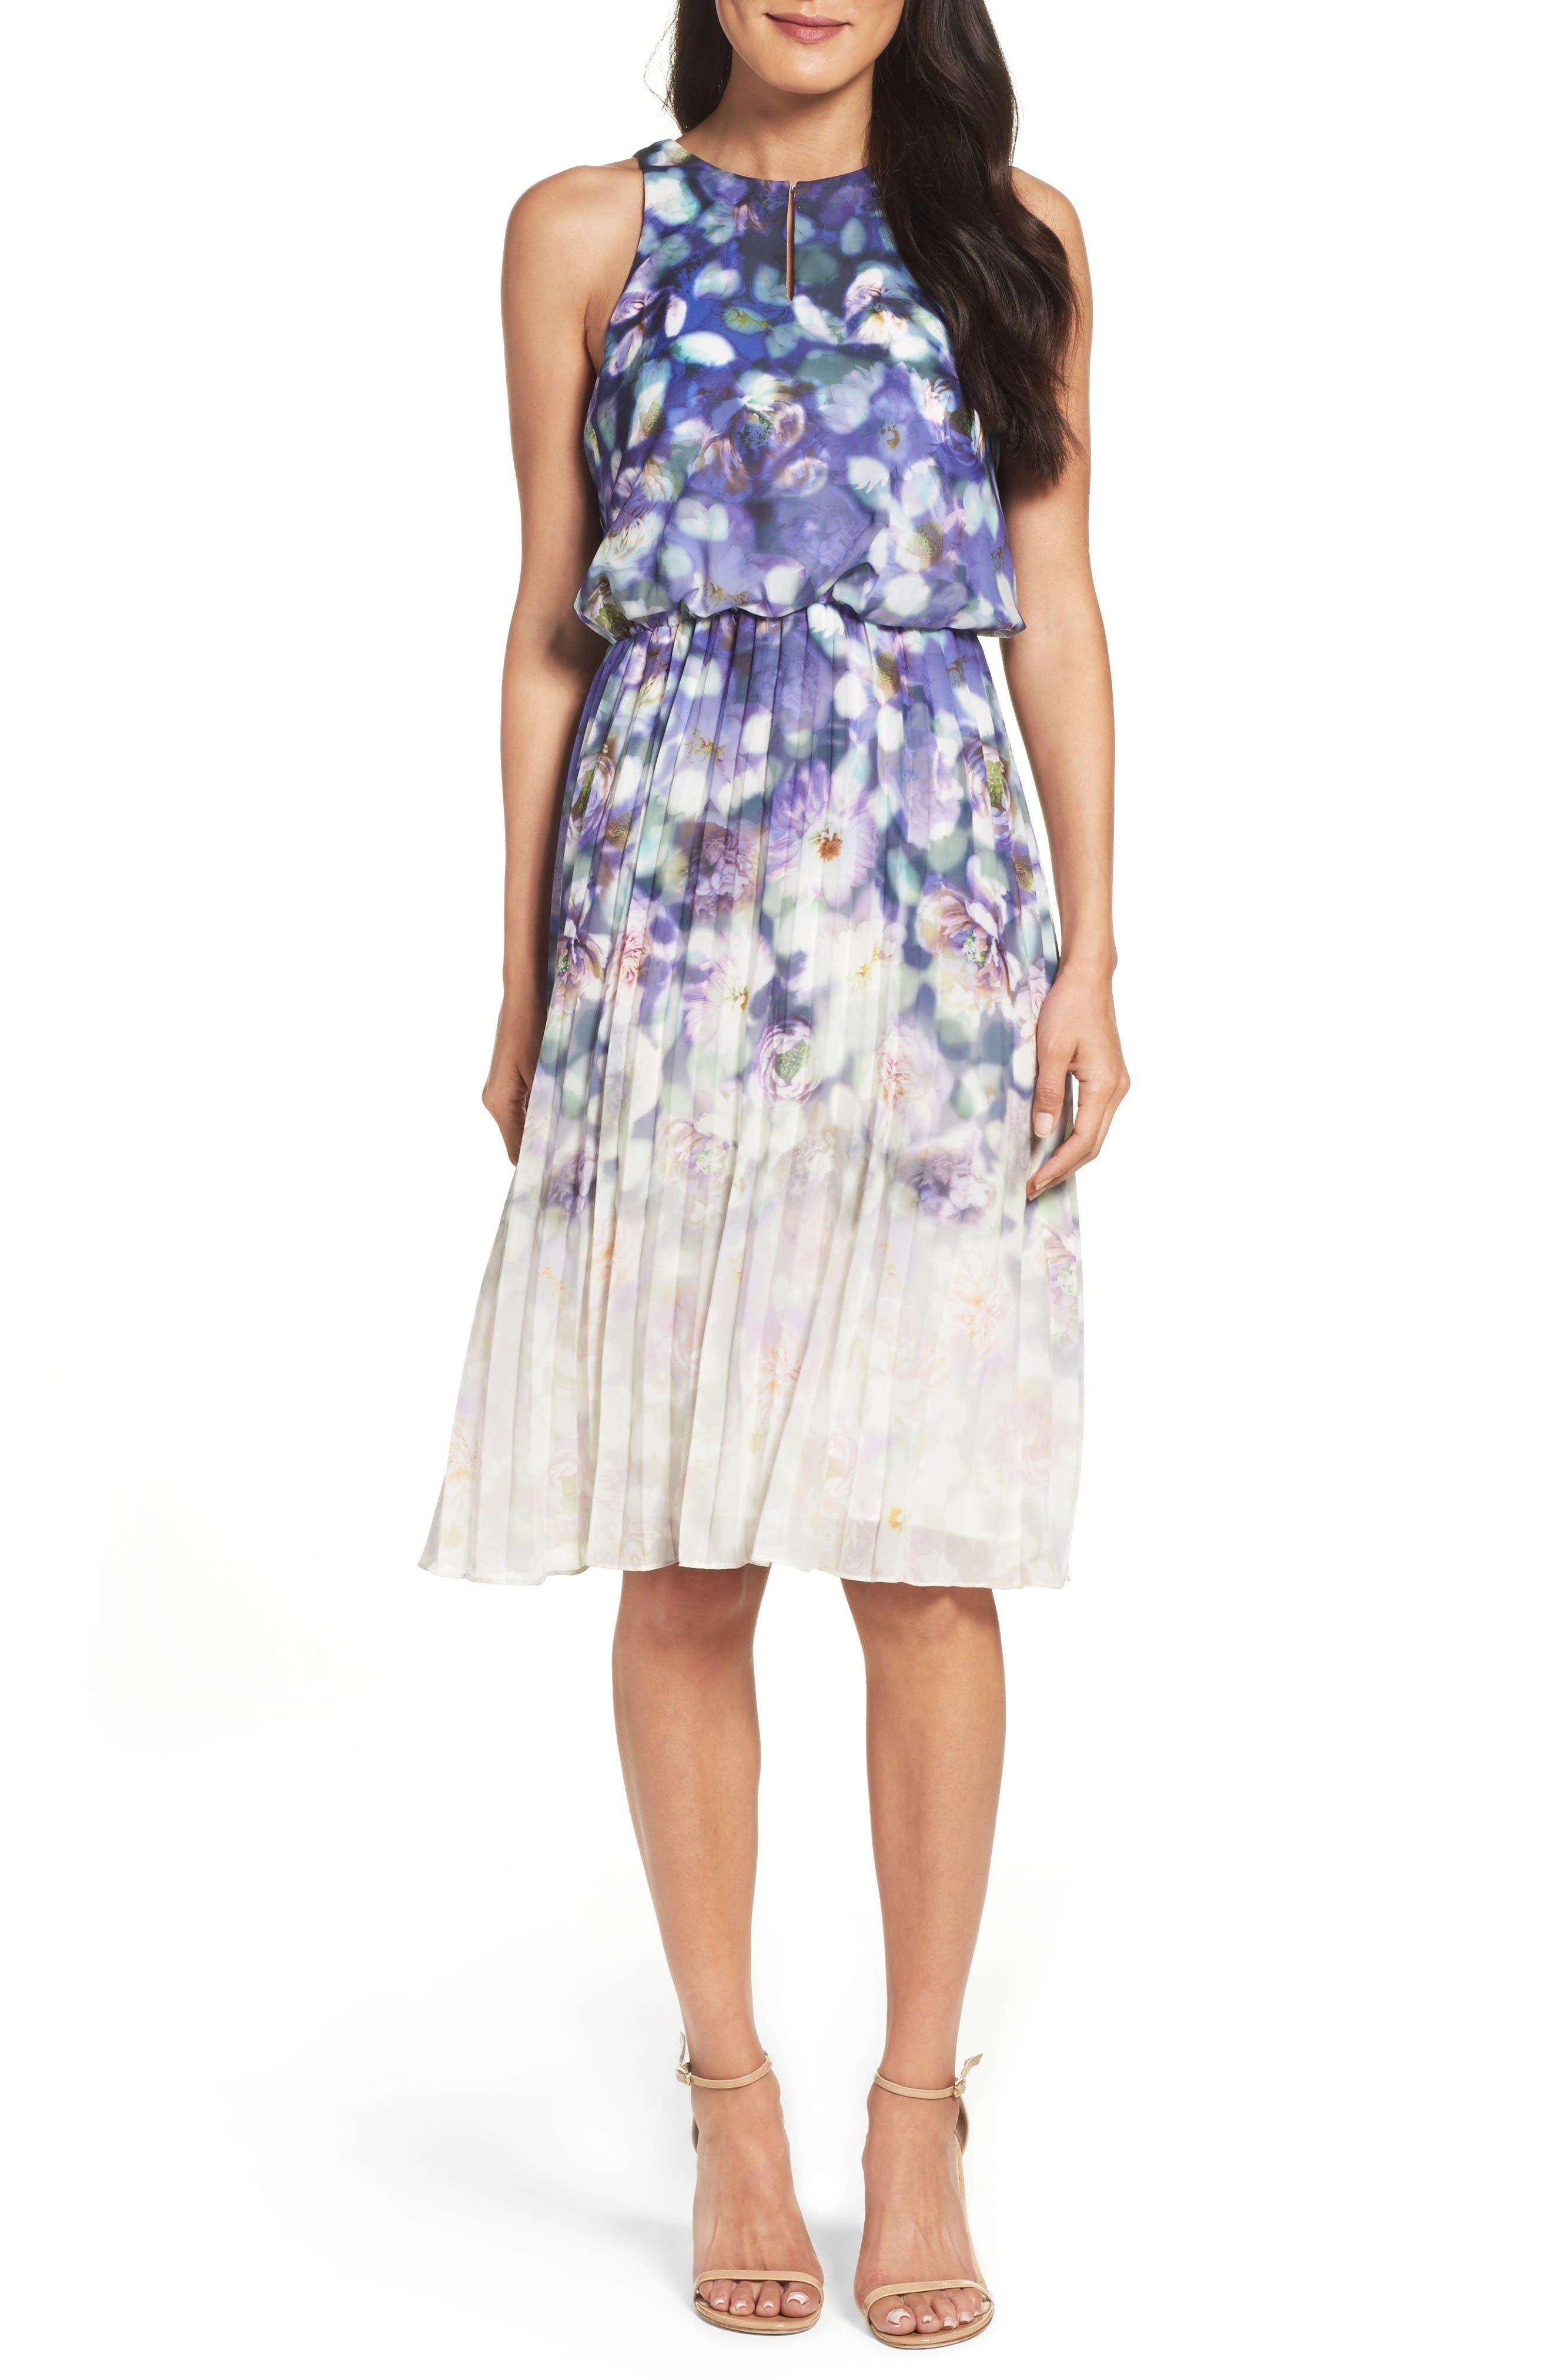 Adrianna Papell Fading Splendor Blouson Dress